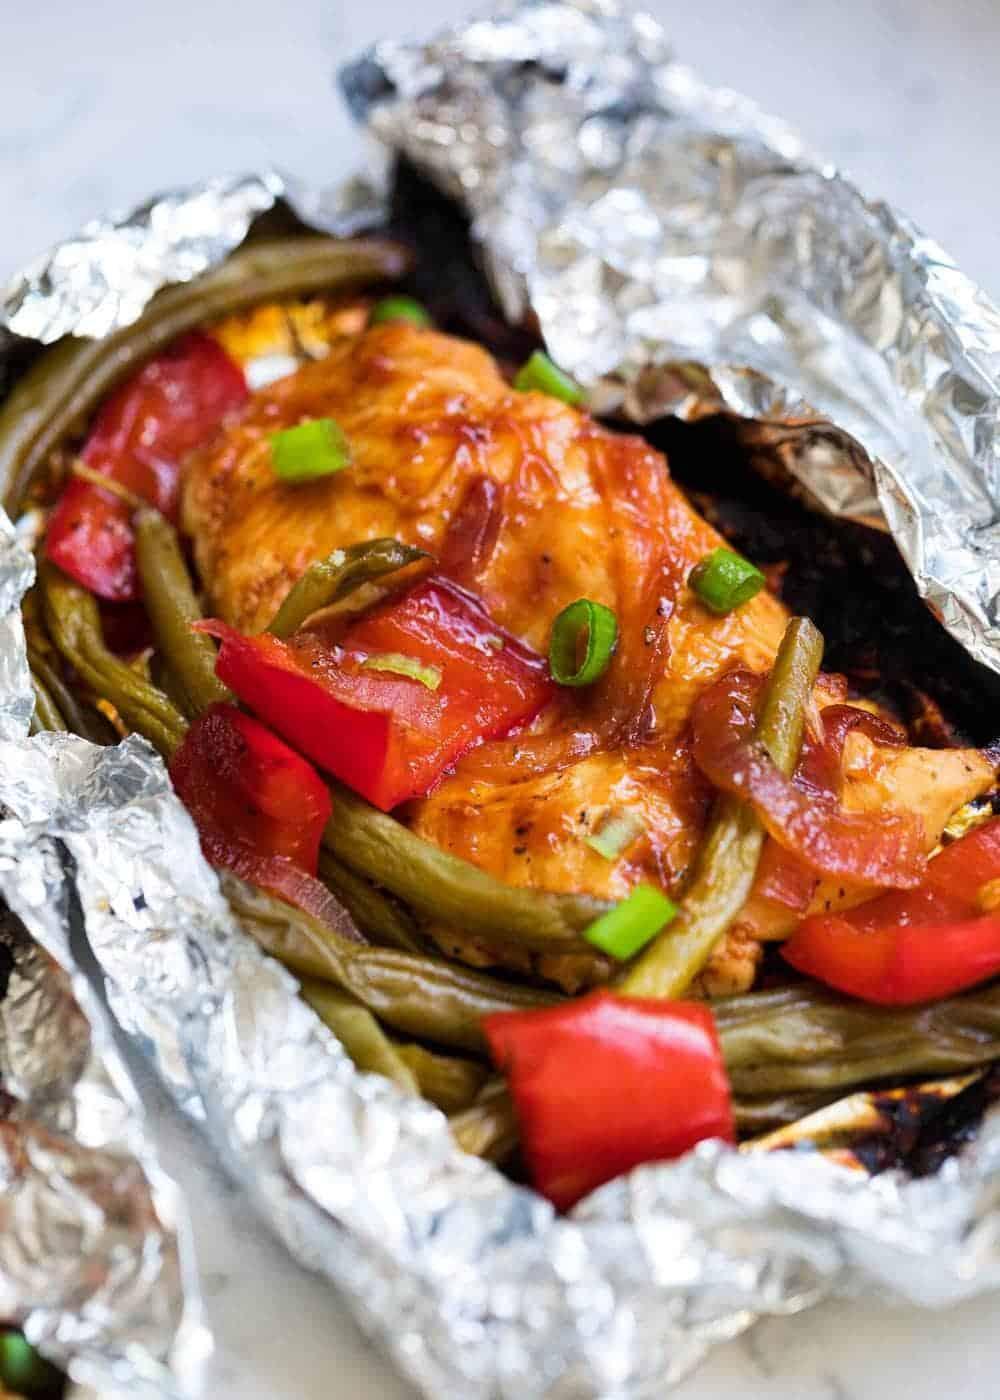 sebzeler ile Barbekü tavuk folyo paket